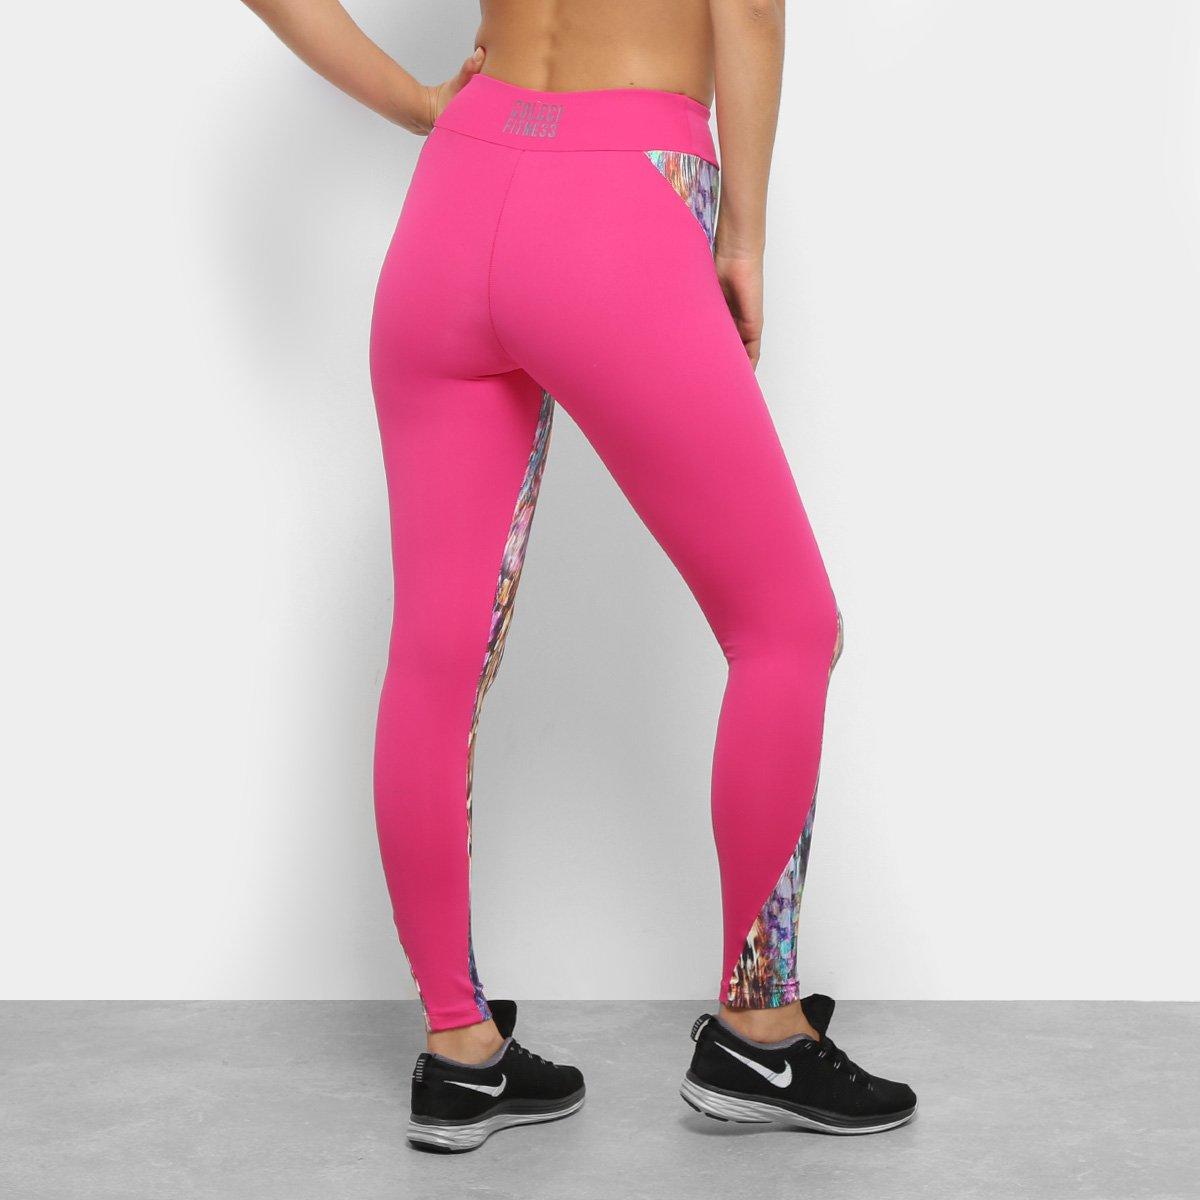 Estampada Legging Legging Colcci Pink Fitness Colcci e Roxo dIB5wqp